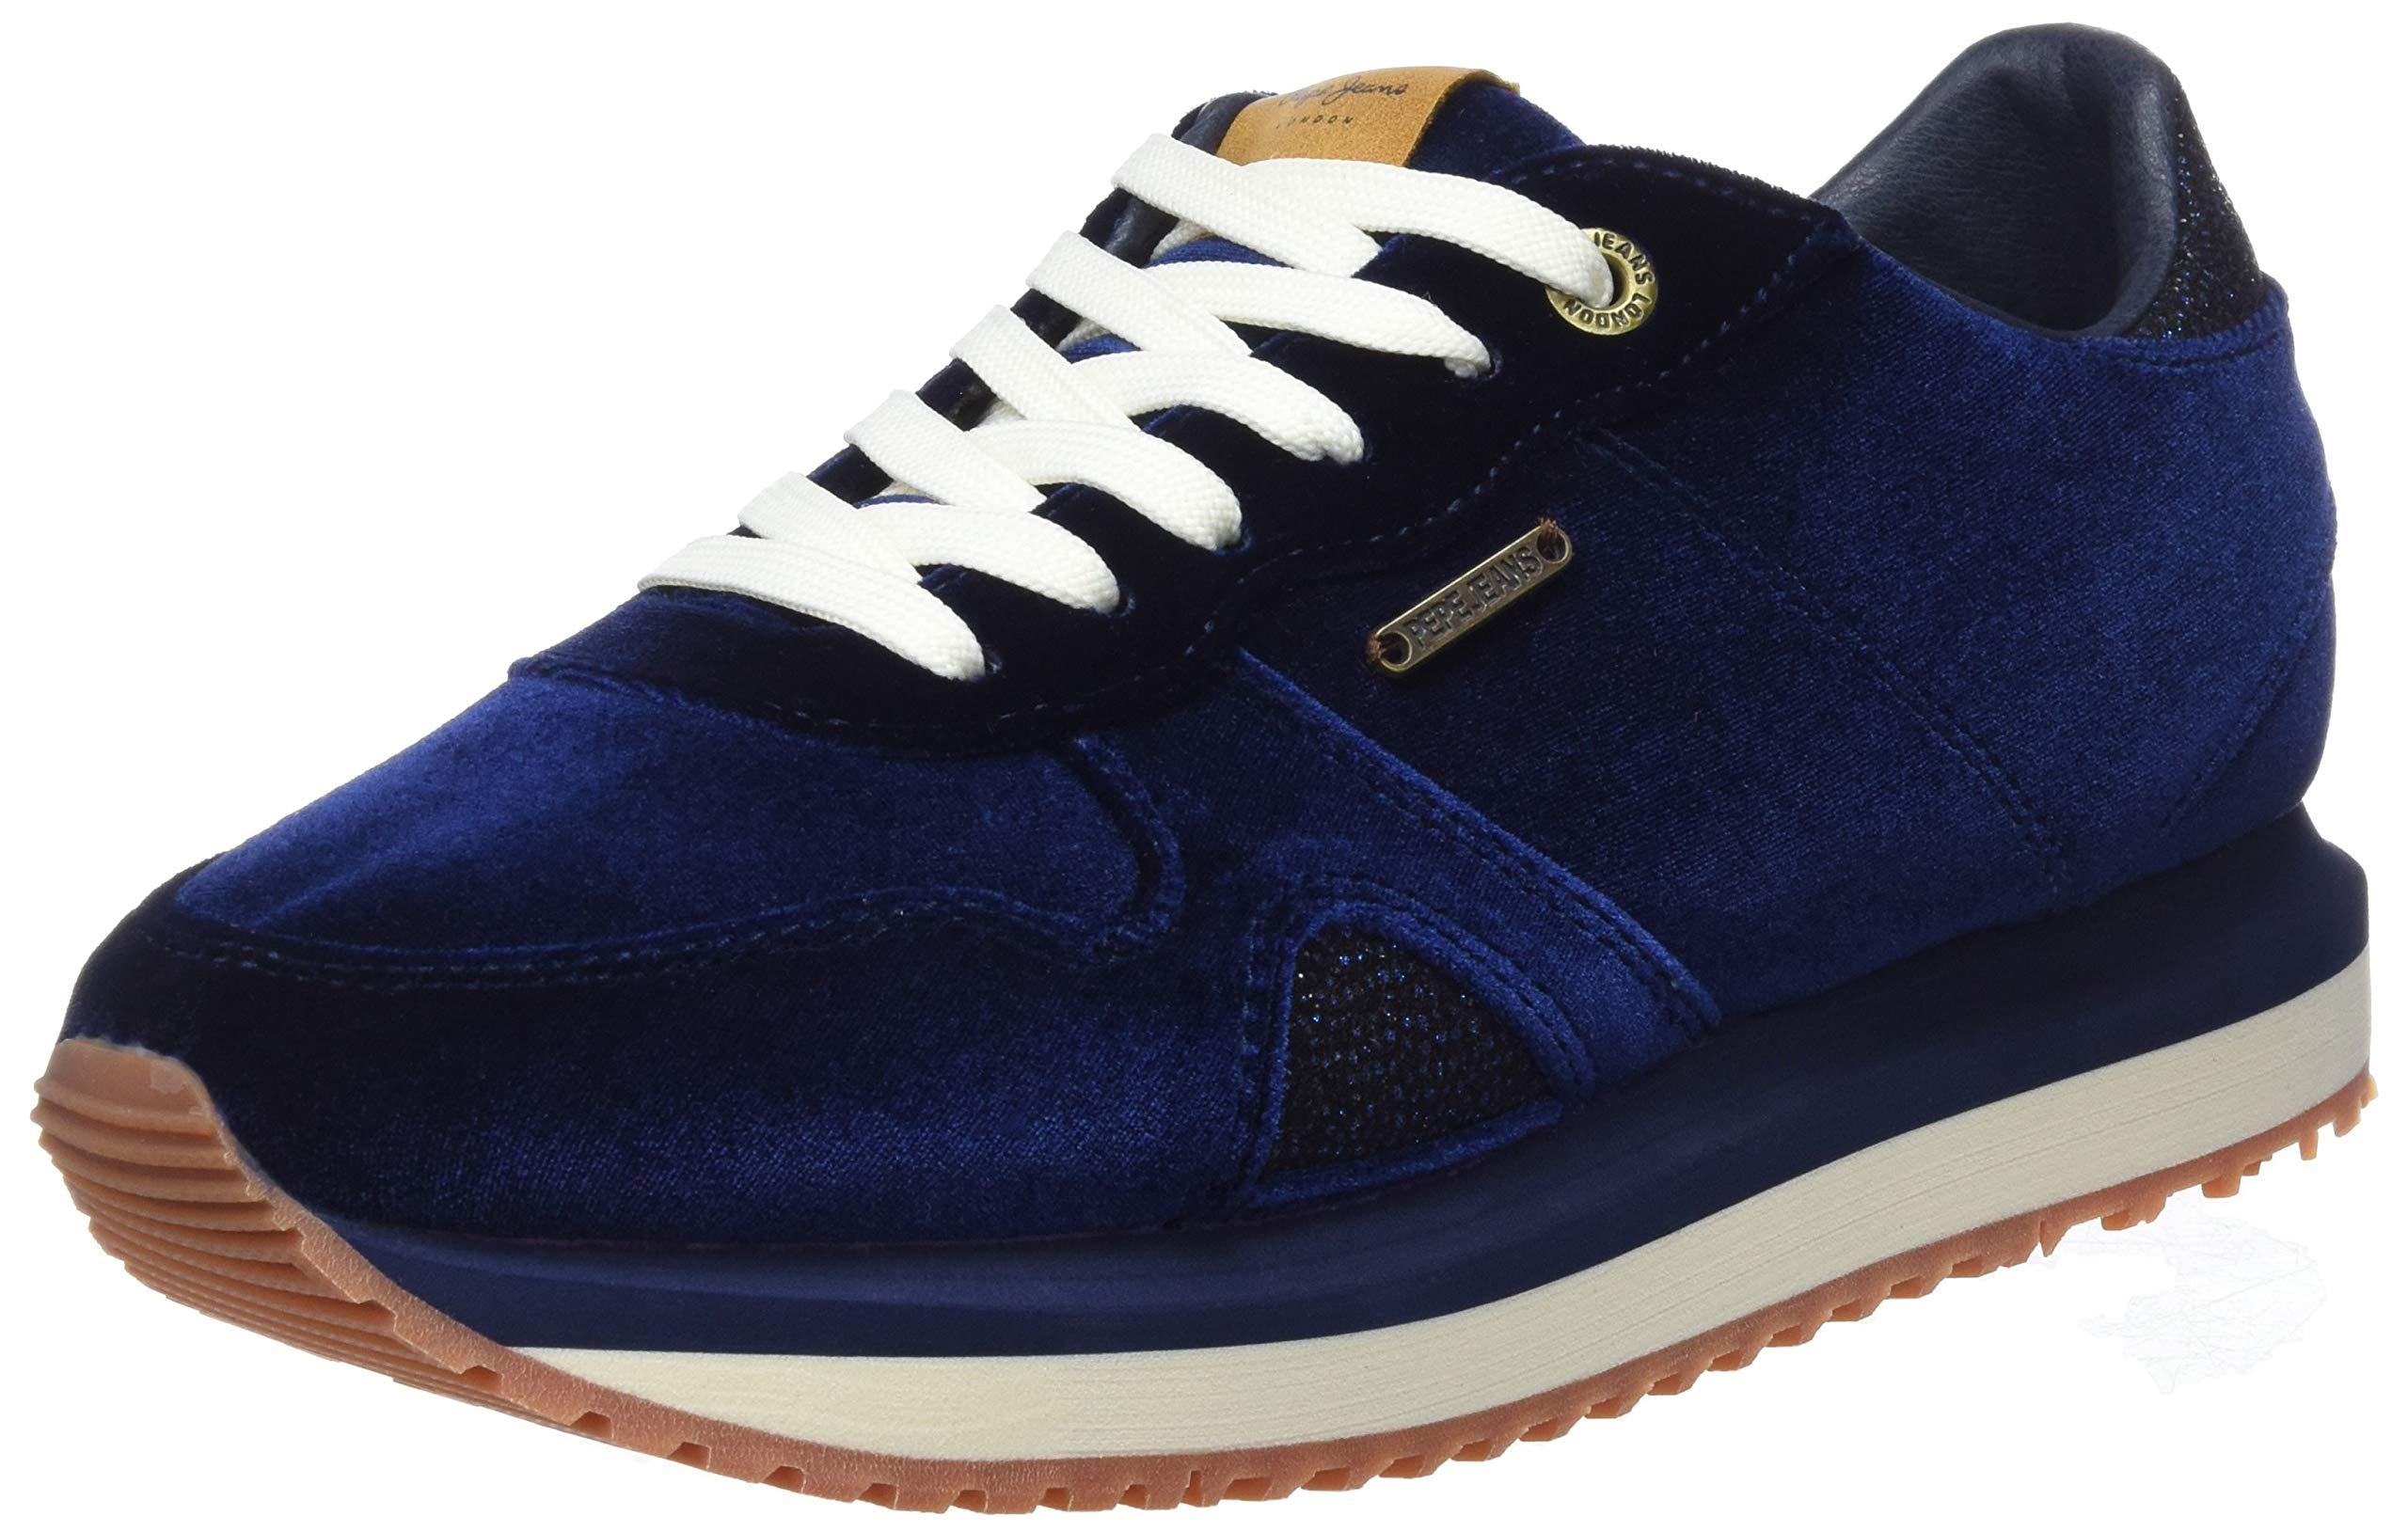 59638 Pepe Blu Zion FemmeBleuairforce London Eu Jeans Basses VelvetBaskets 80vNynwOm